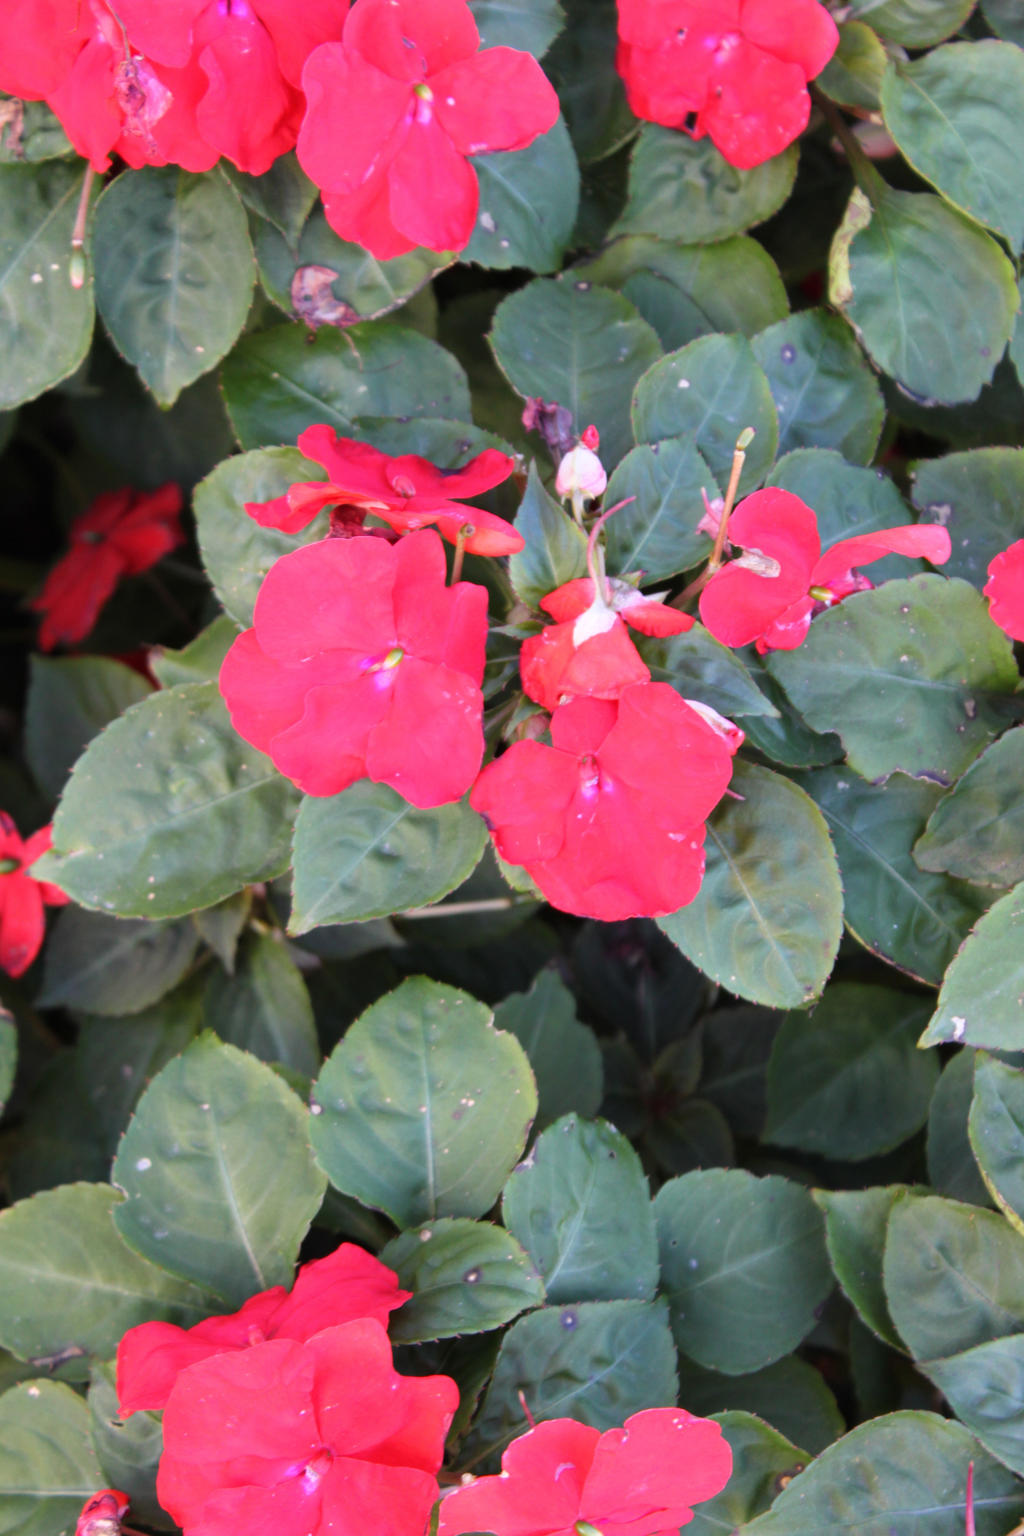 Flowers by Hjoranna